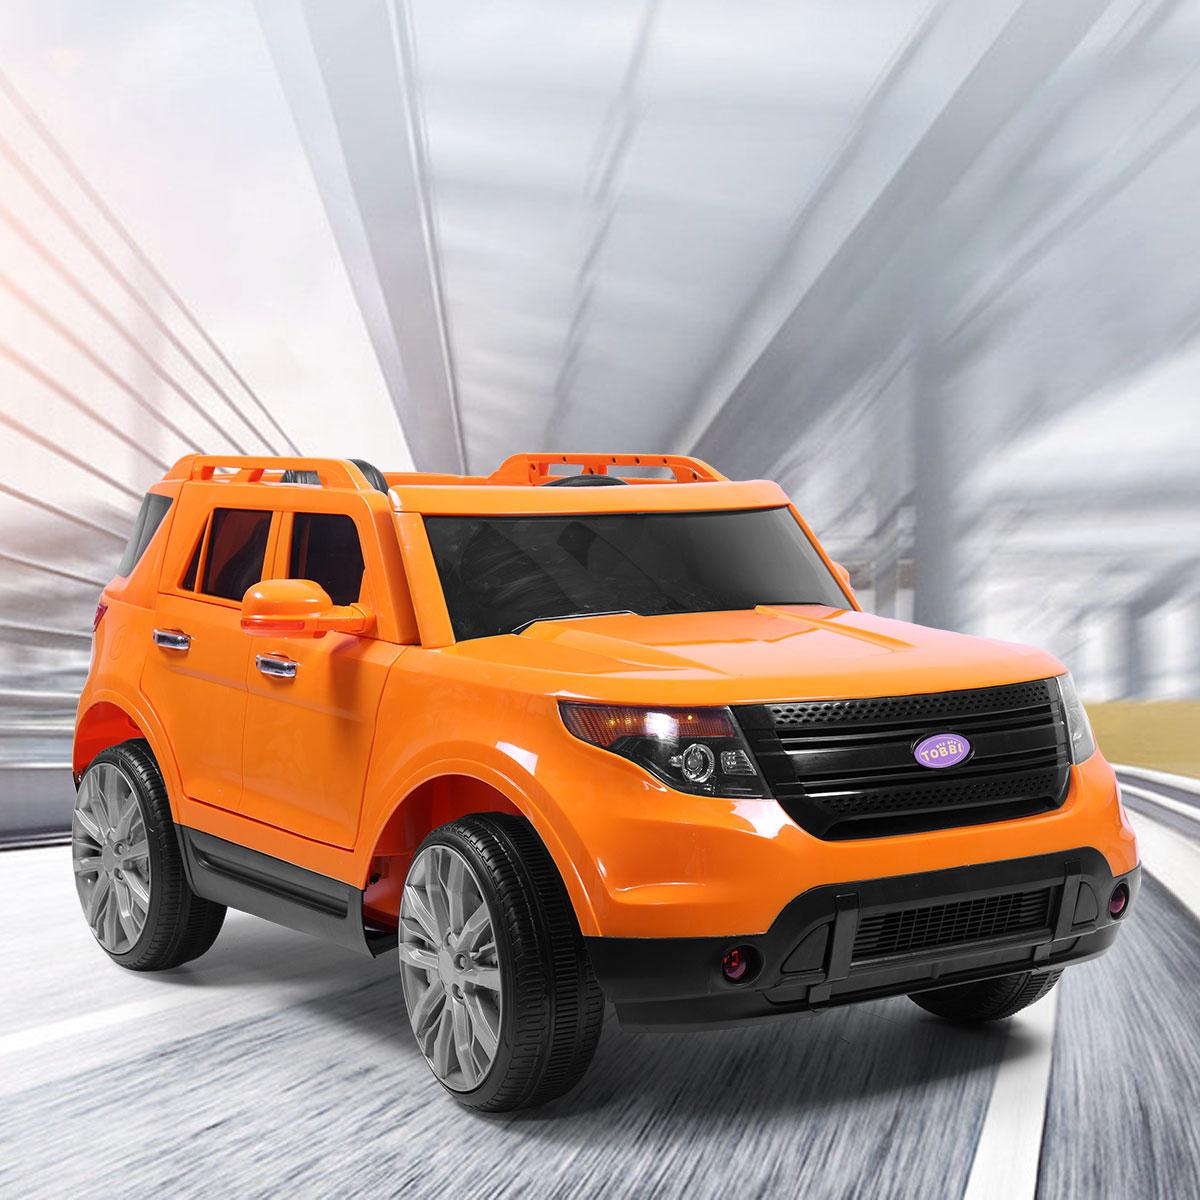 Jaxpety Orange 6V Kids Ride On Car W/MP3 Electric Battery Power Remote Control